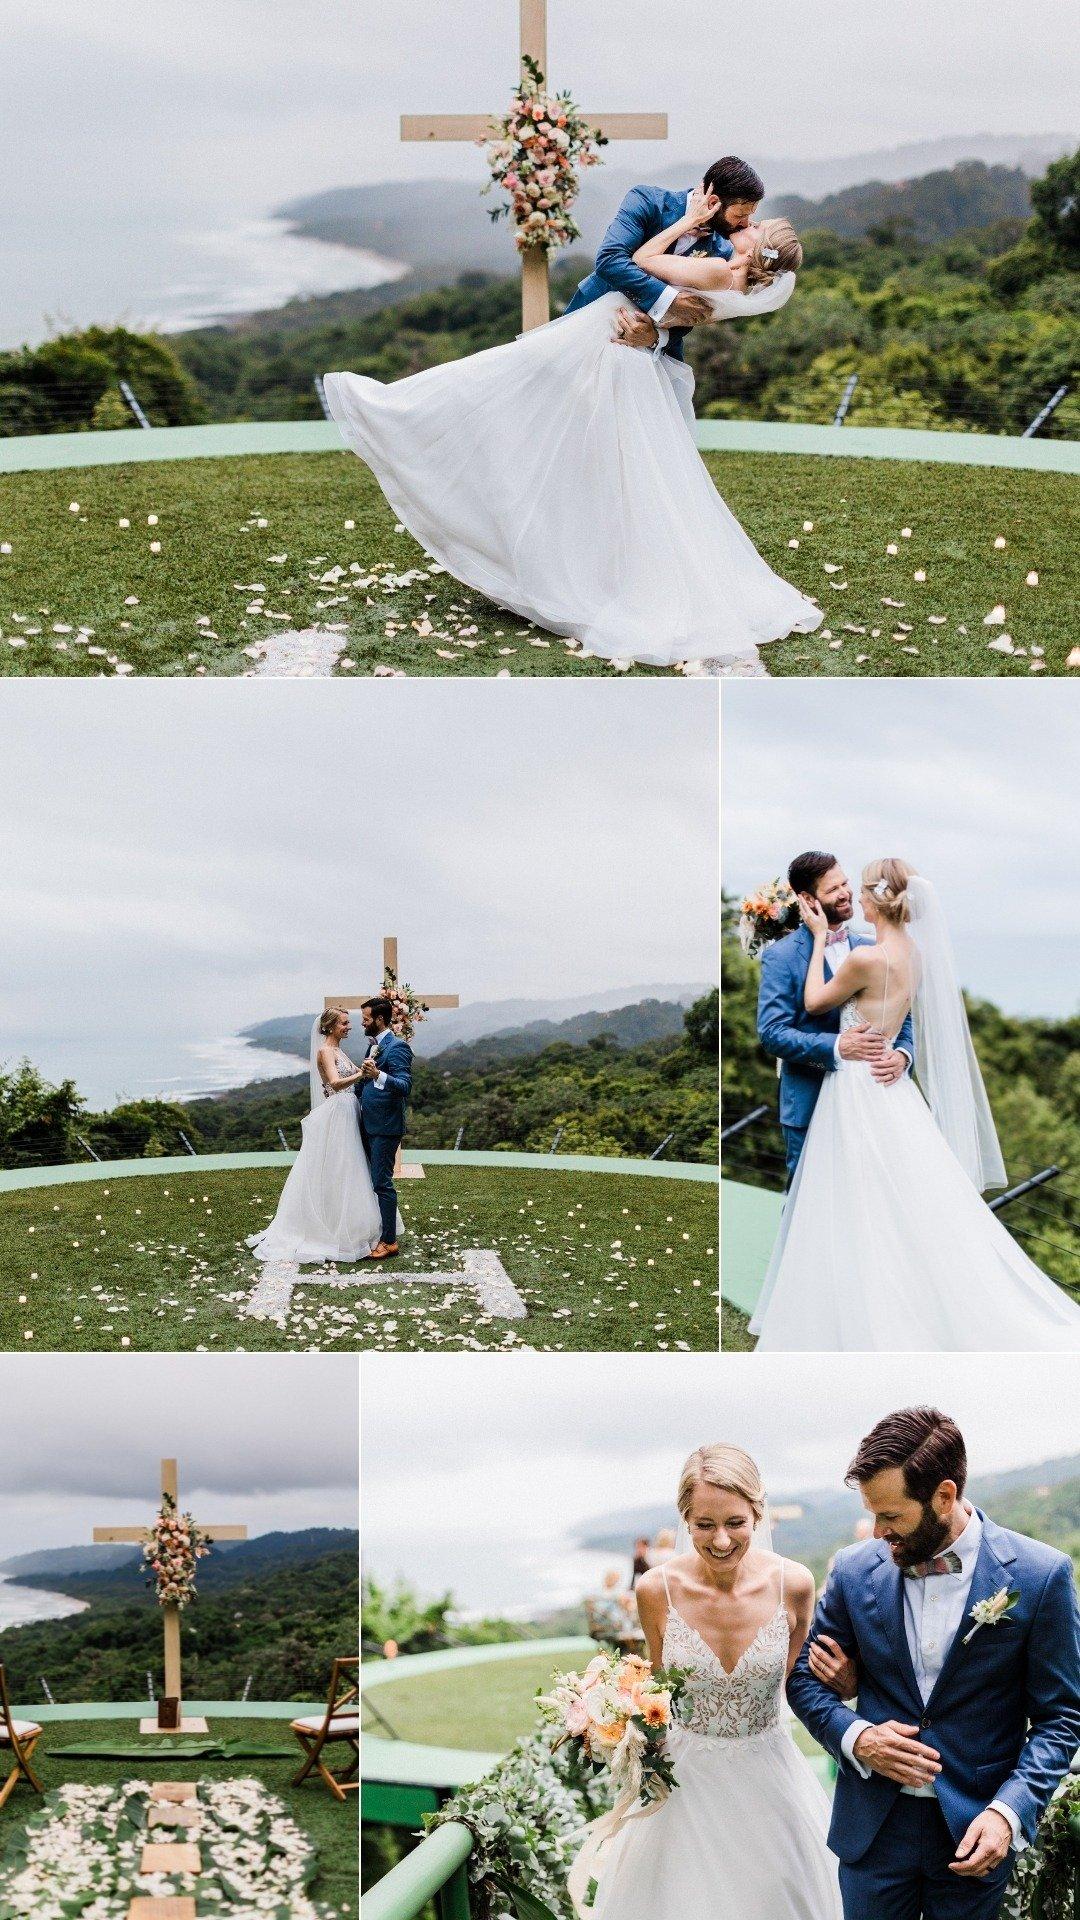 mountain and ocean view wedding in Santa Teresa costa rica